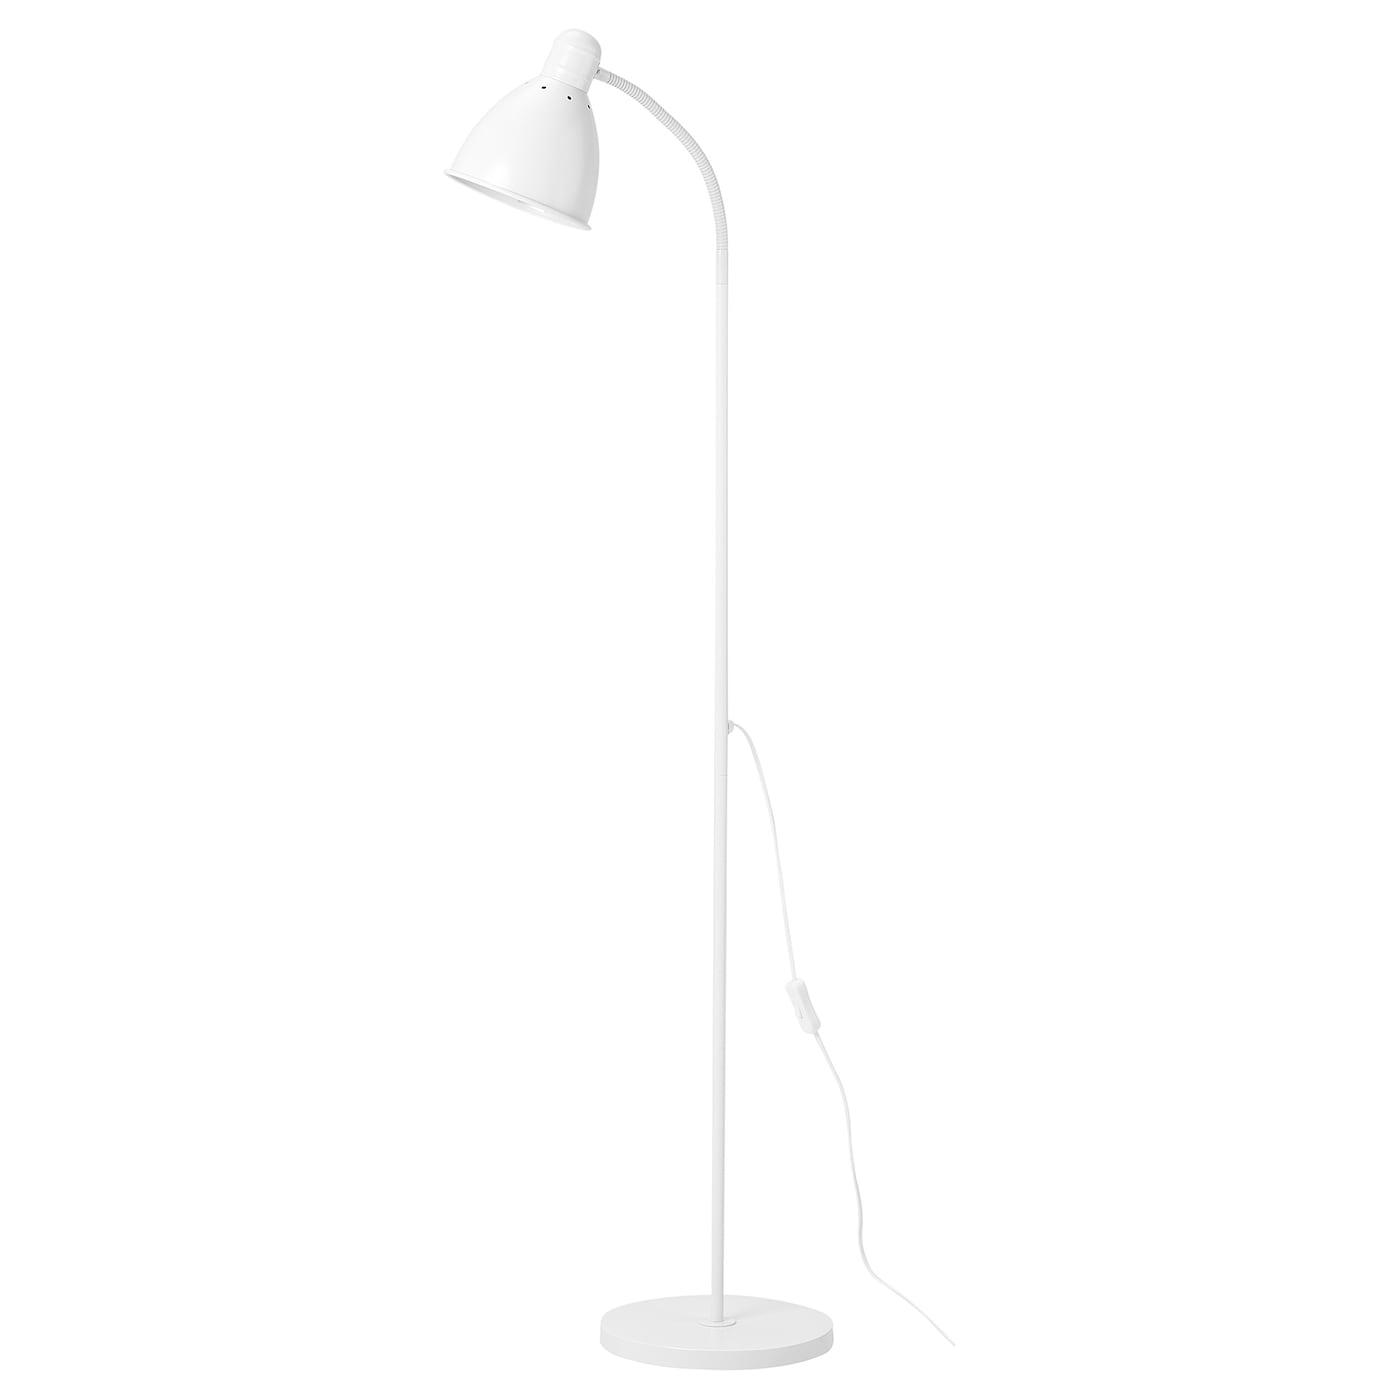 Ikea Stehlampe Bast